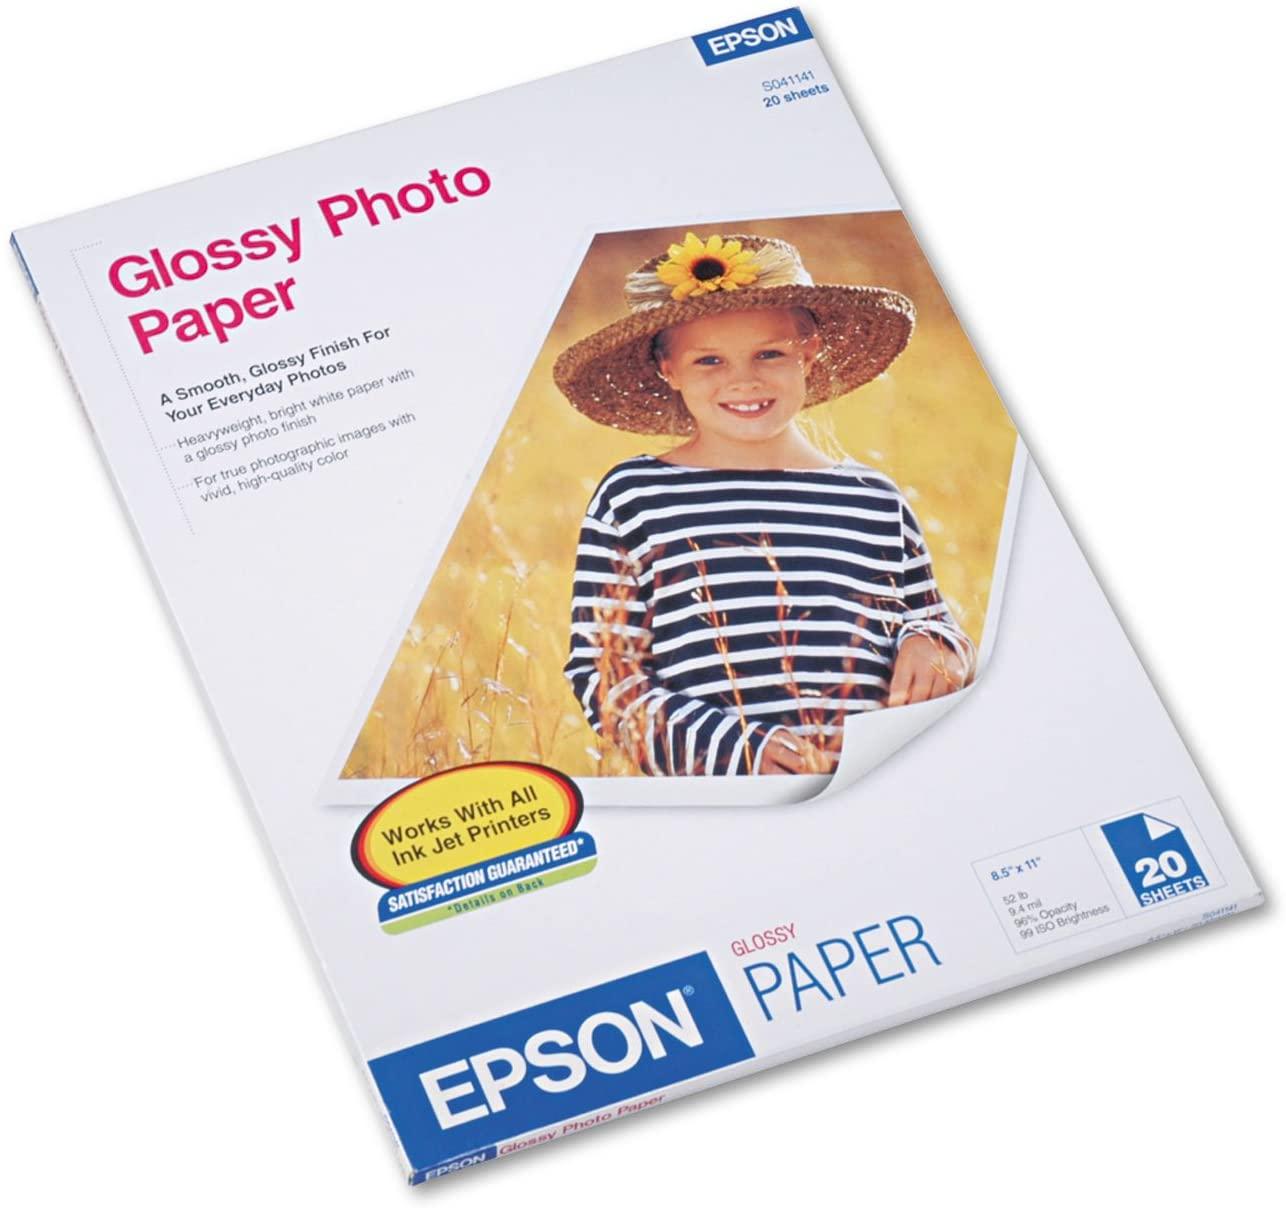 EPSS041141 - Glossy Photo Paper